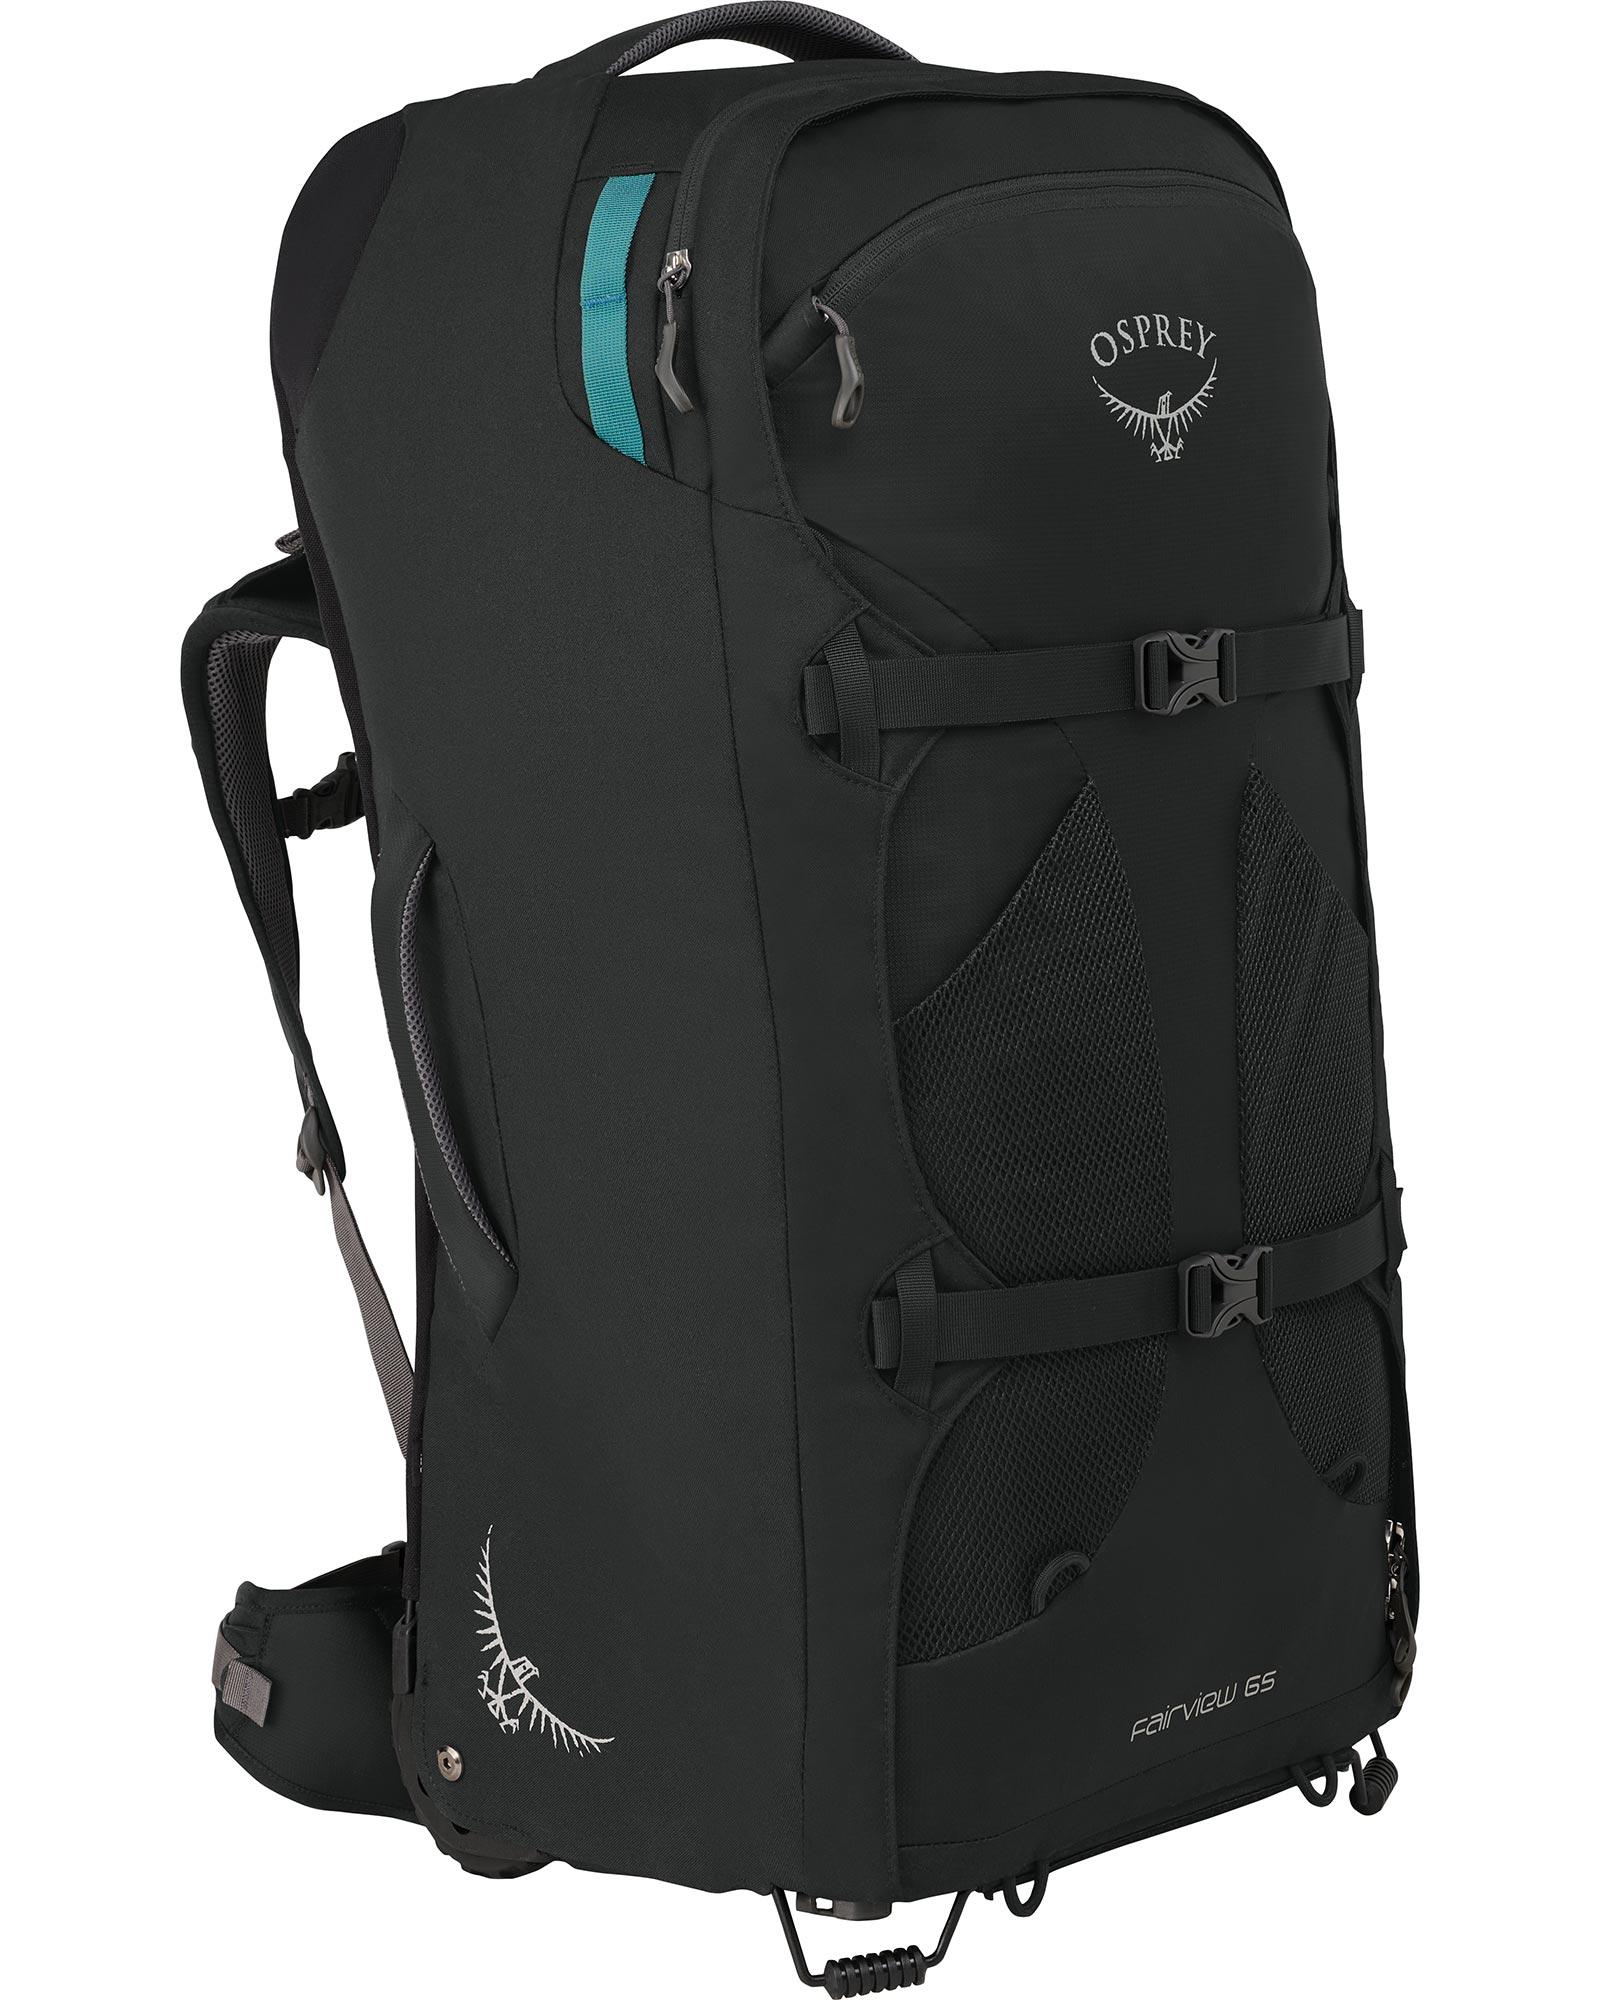 Osprey Fairview Wheels 65L Women's Travel Luggage 0